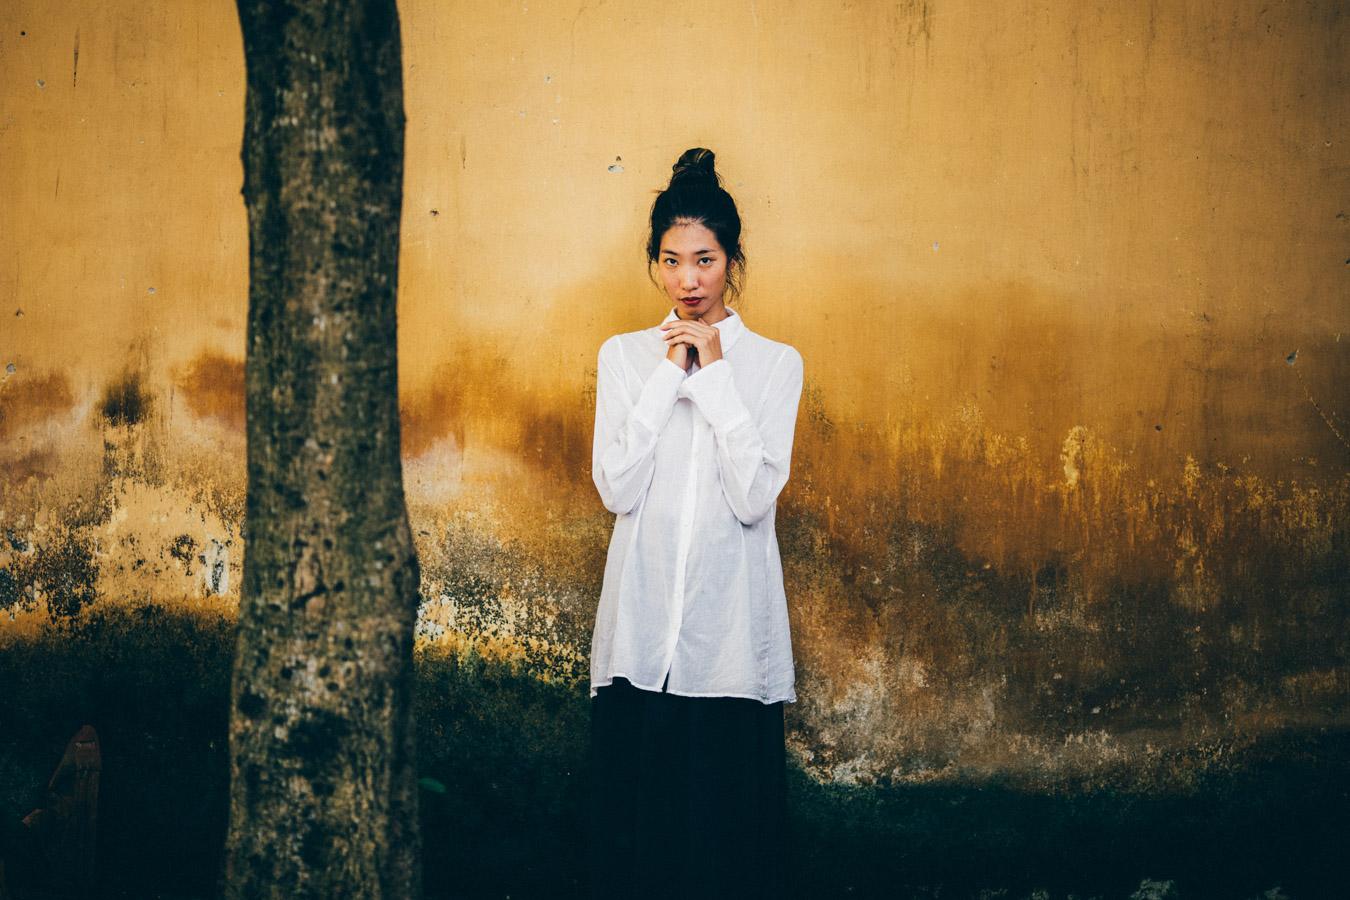 Asia-Fashion-Photographer-24-1.jpg